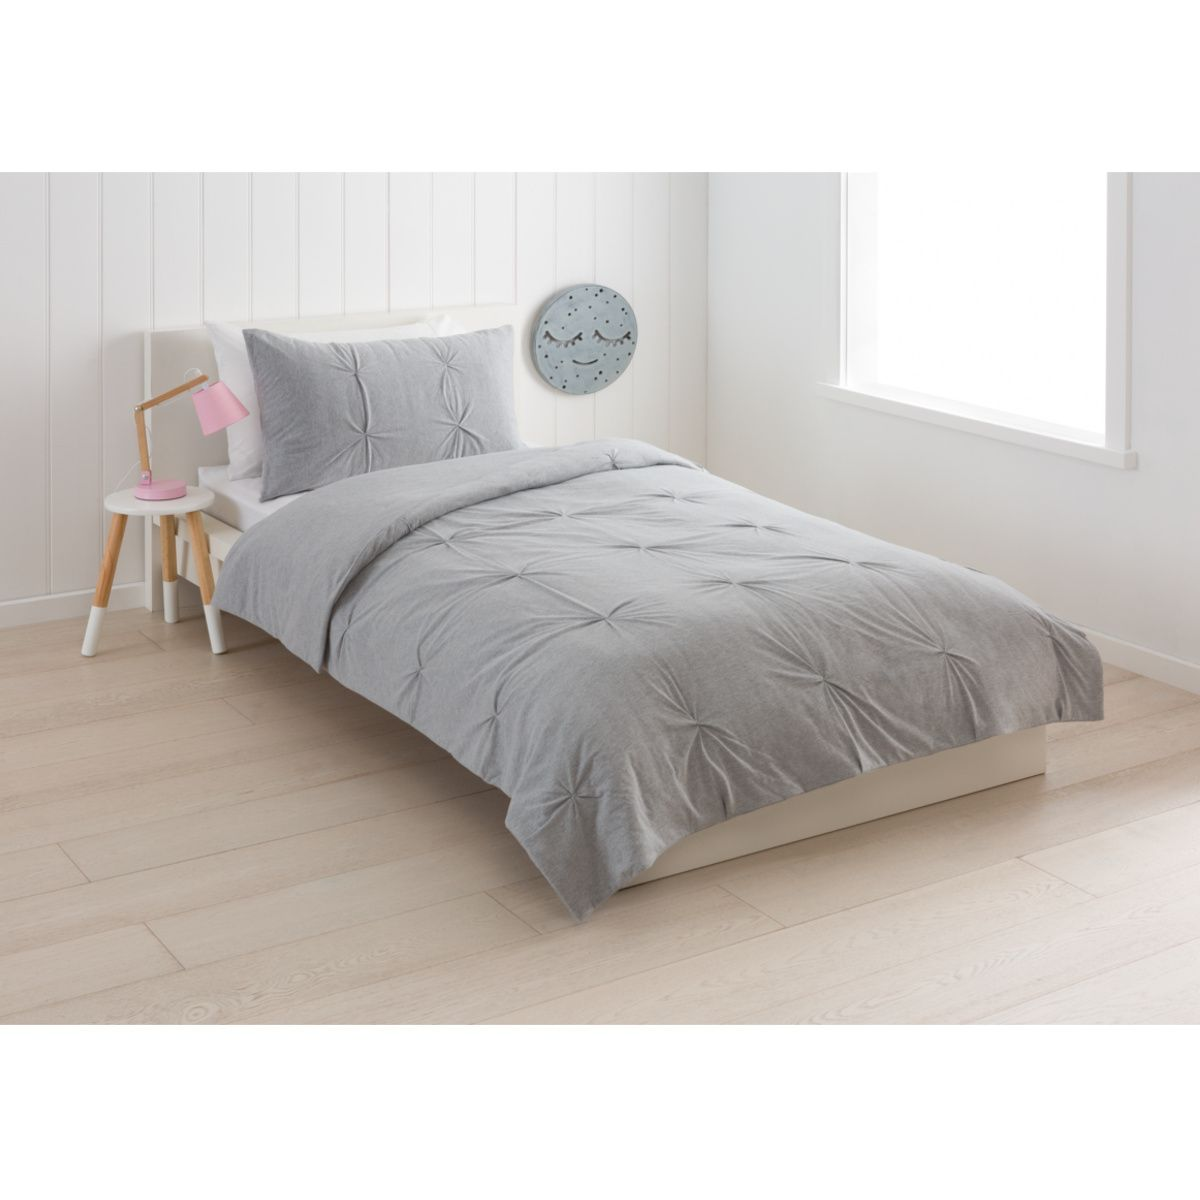 Jersey Pintuck Comforter Set Single Bed Grey Kmart Bed